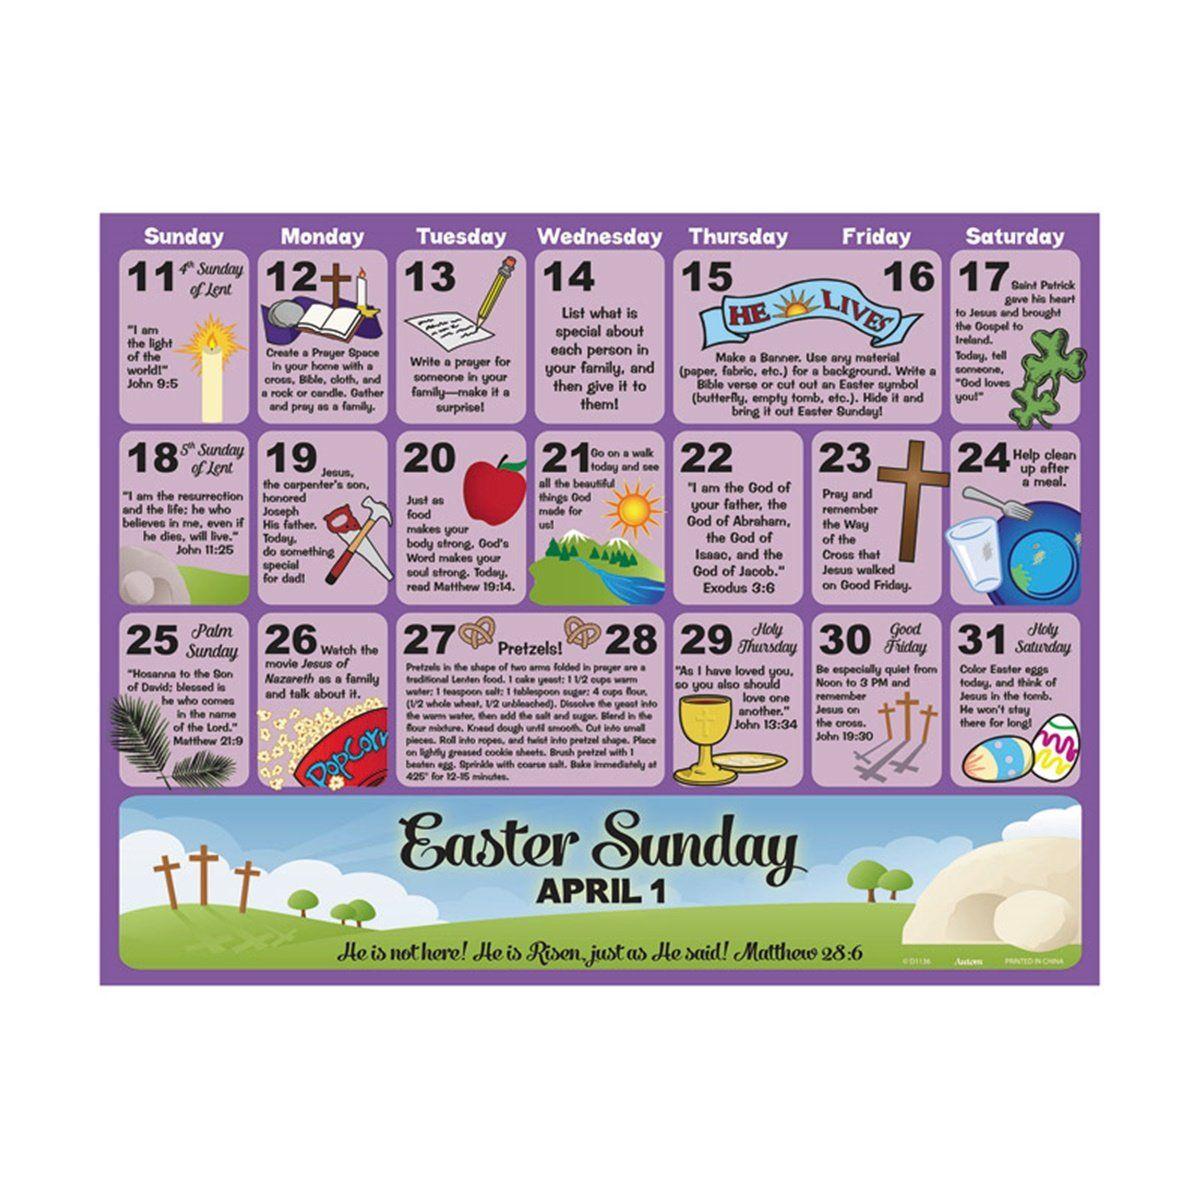 Living Lent Childrens Lenten Activity And Scripture Calendar For